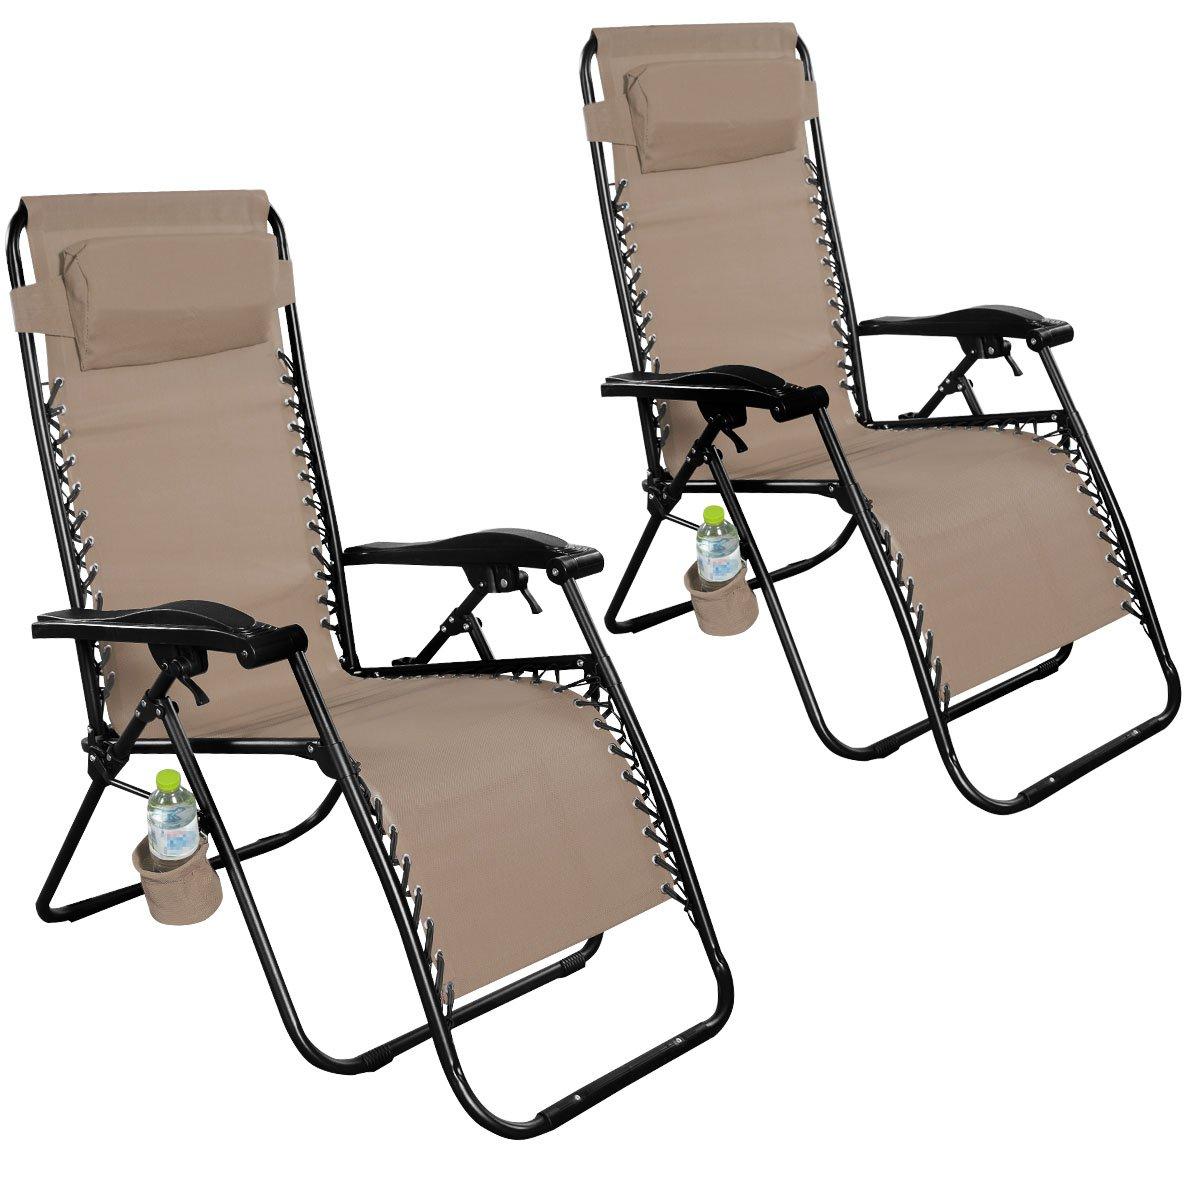 Giantex Folding Lounge Chairs Recliner Zero Gravity Outdoor Beach Patio Garden (2Tan)